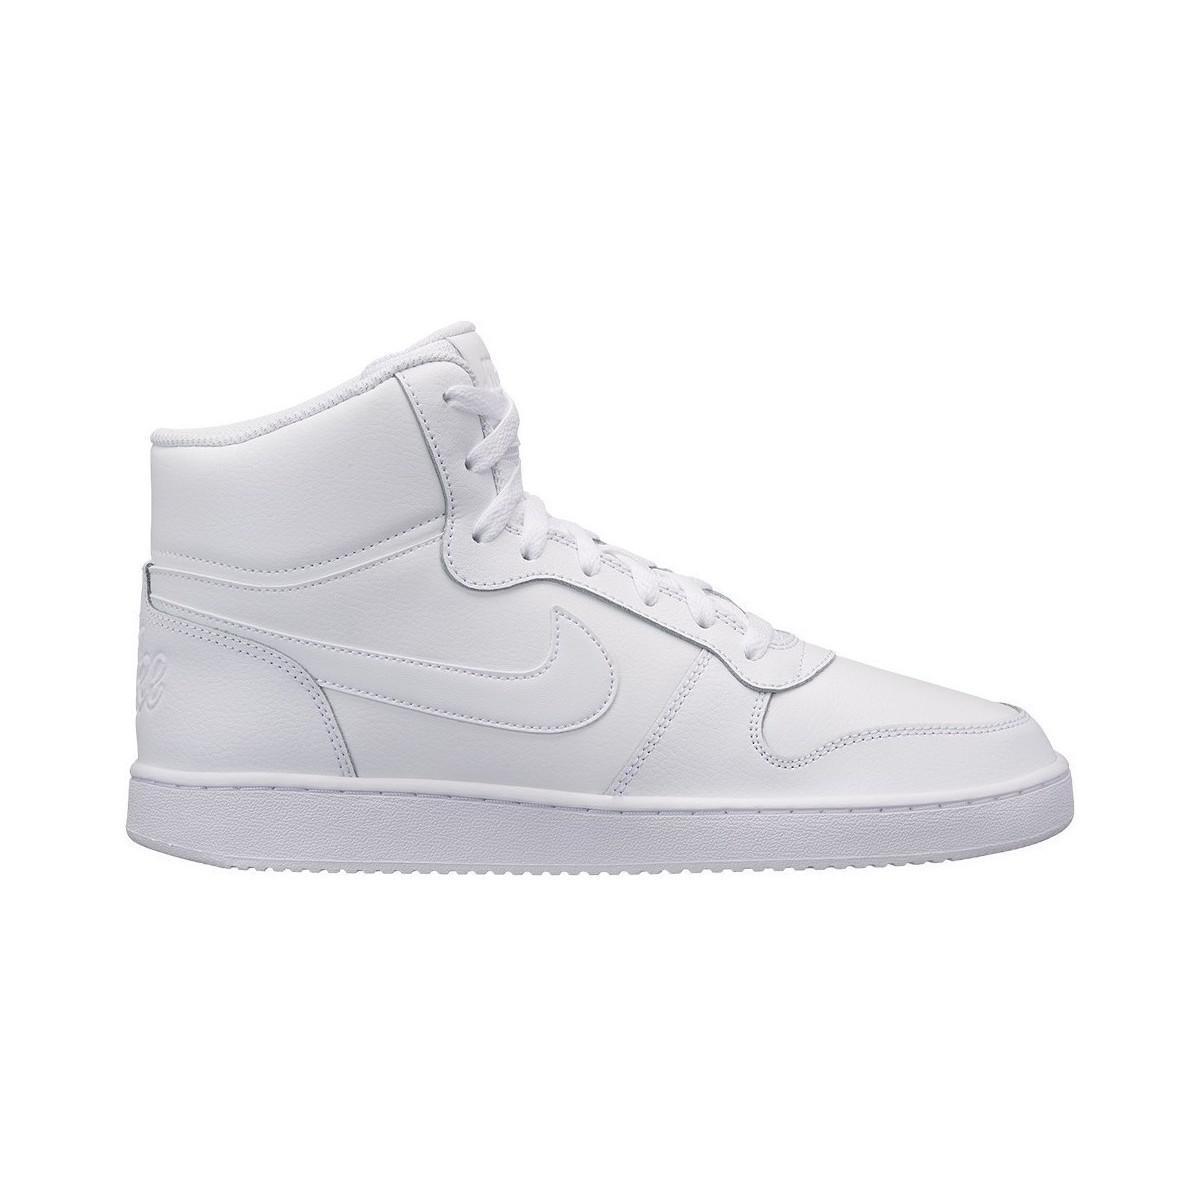 Nike Leather Court Borough Mid Basketball Shoes in White White White White (White) for Men